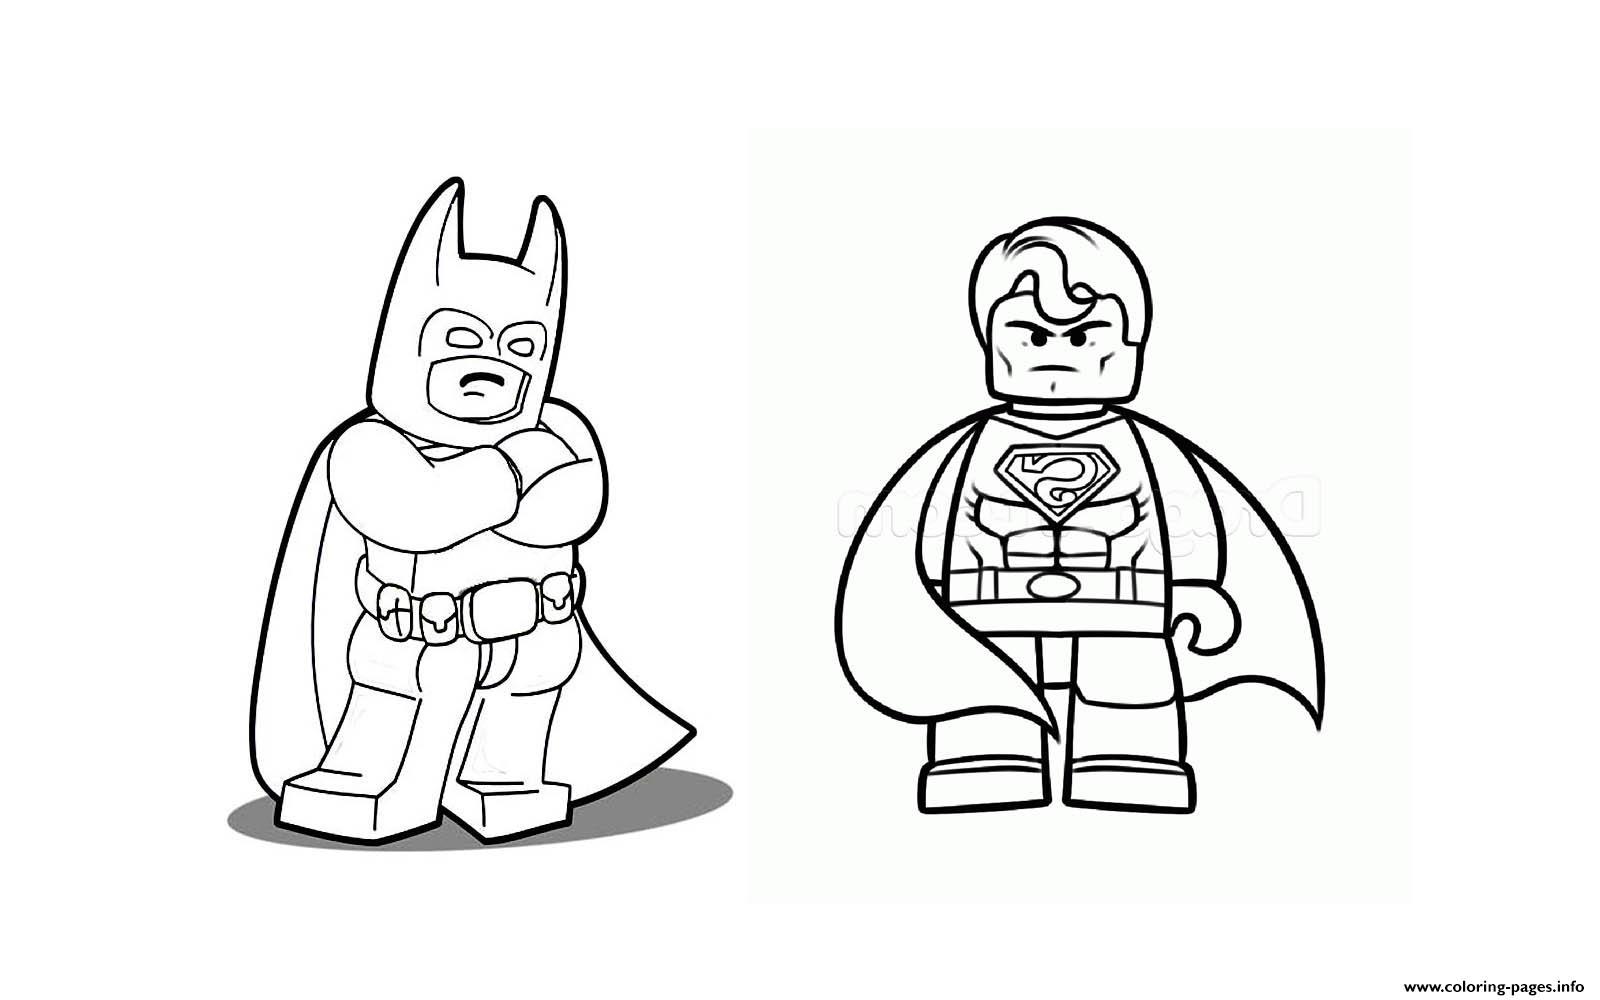 - Batman Vs Superman Coloring Pages - Coloring Home